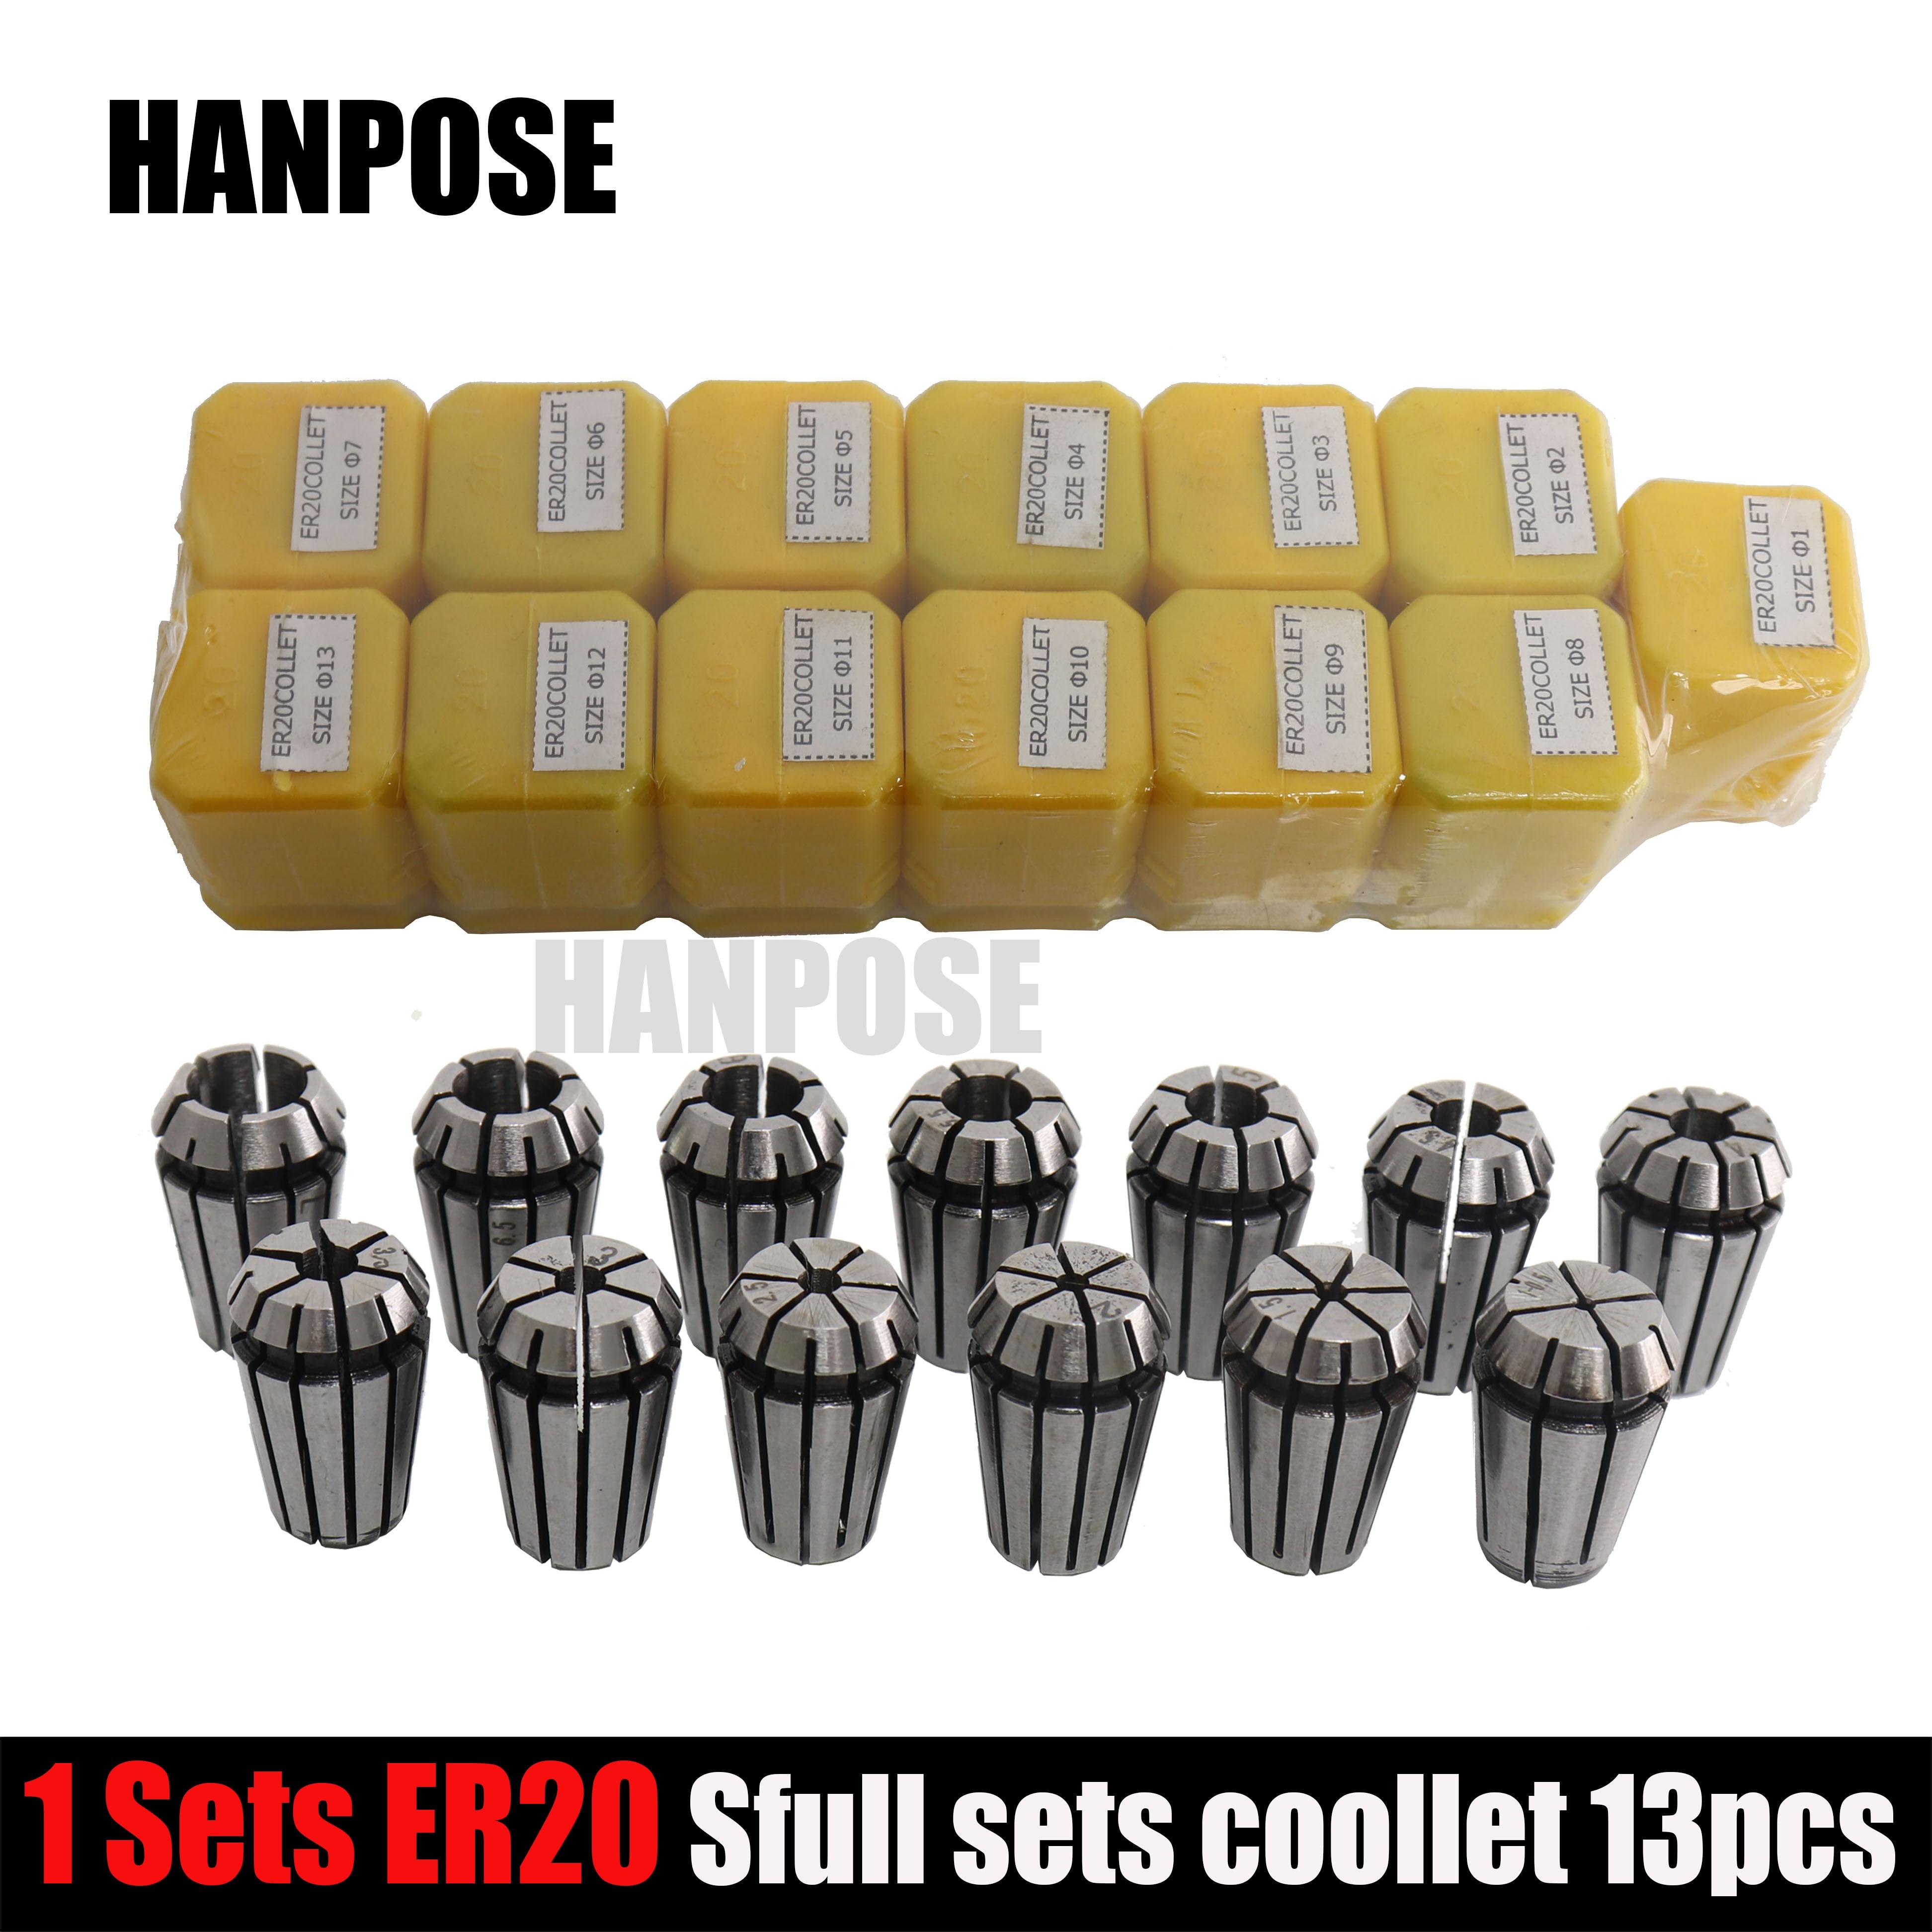 Najlepsza cena 13 sztuk / zestaw ER20 Precision Spring Collet Set Frezarka CNC Narzędzie ER20 Spring Collet Chuck